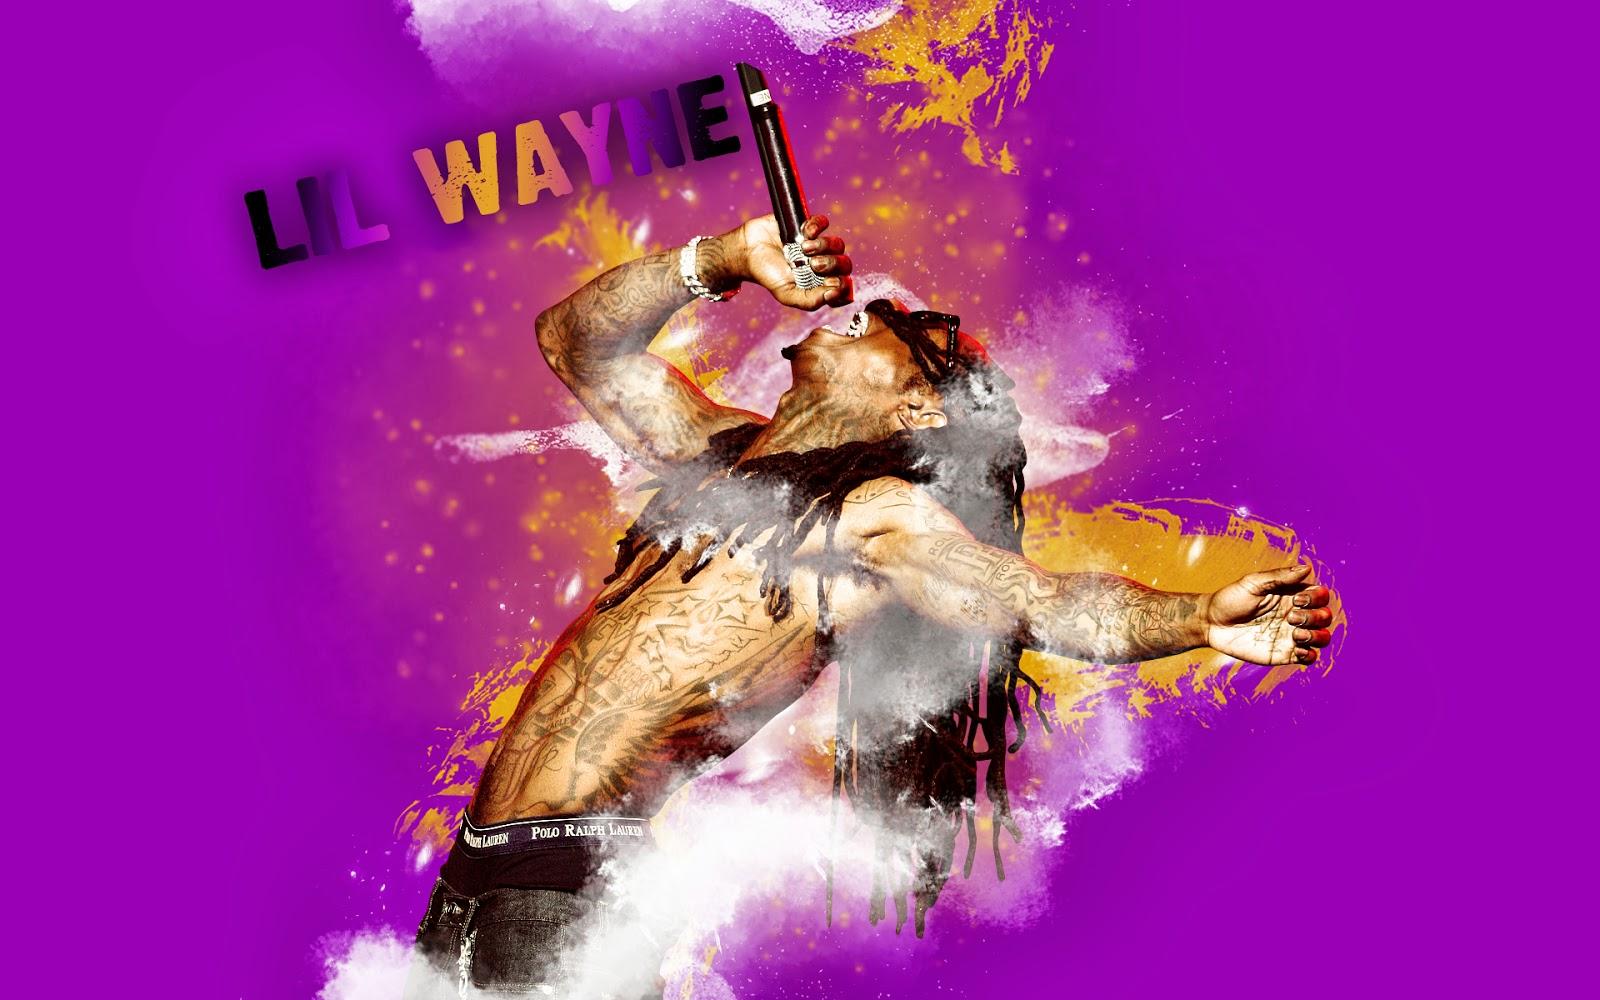 LIL WAYNELil Wayne Wallpaper For Desktop 2013